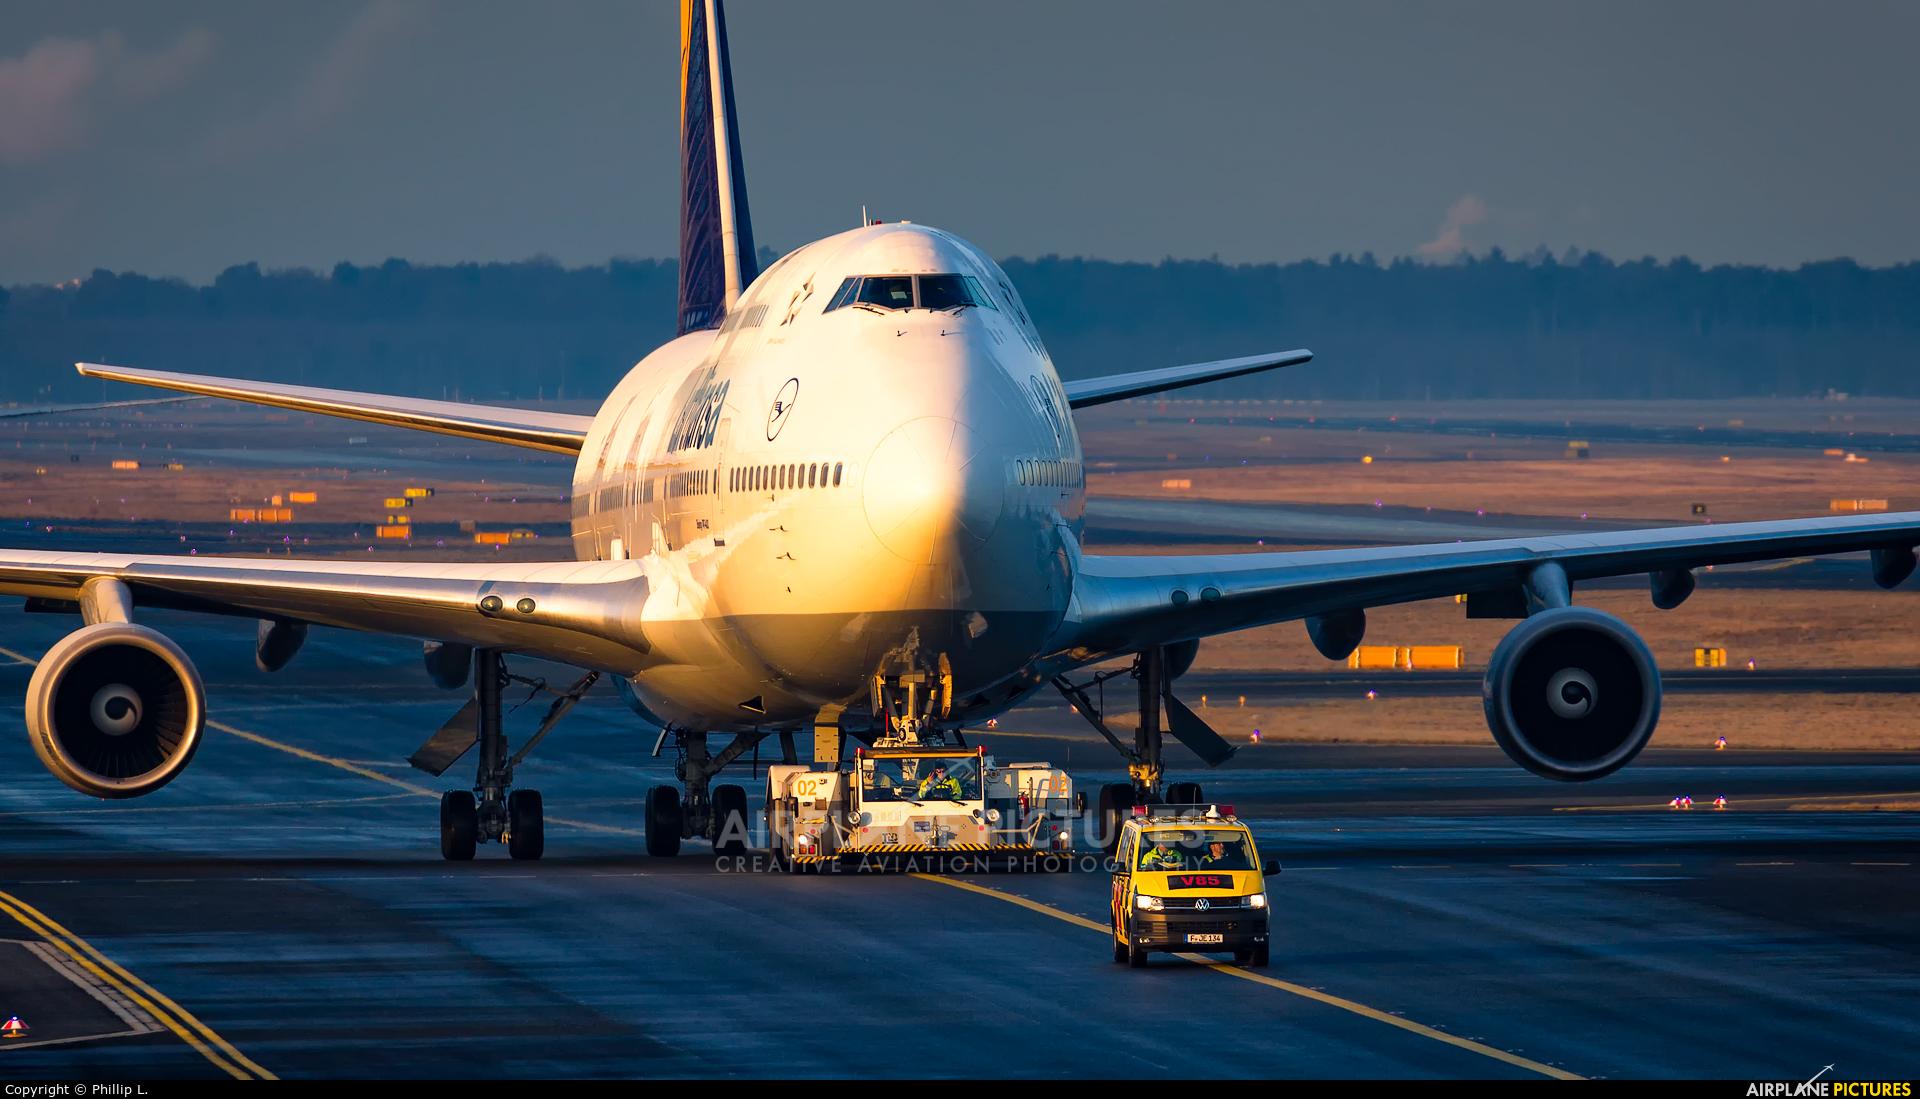 Lufthansa D-ABVR aircraft at Frankfurt